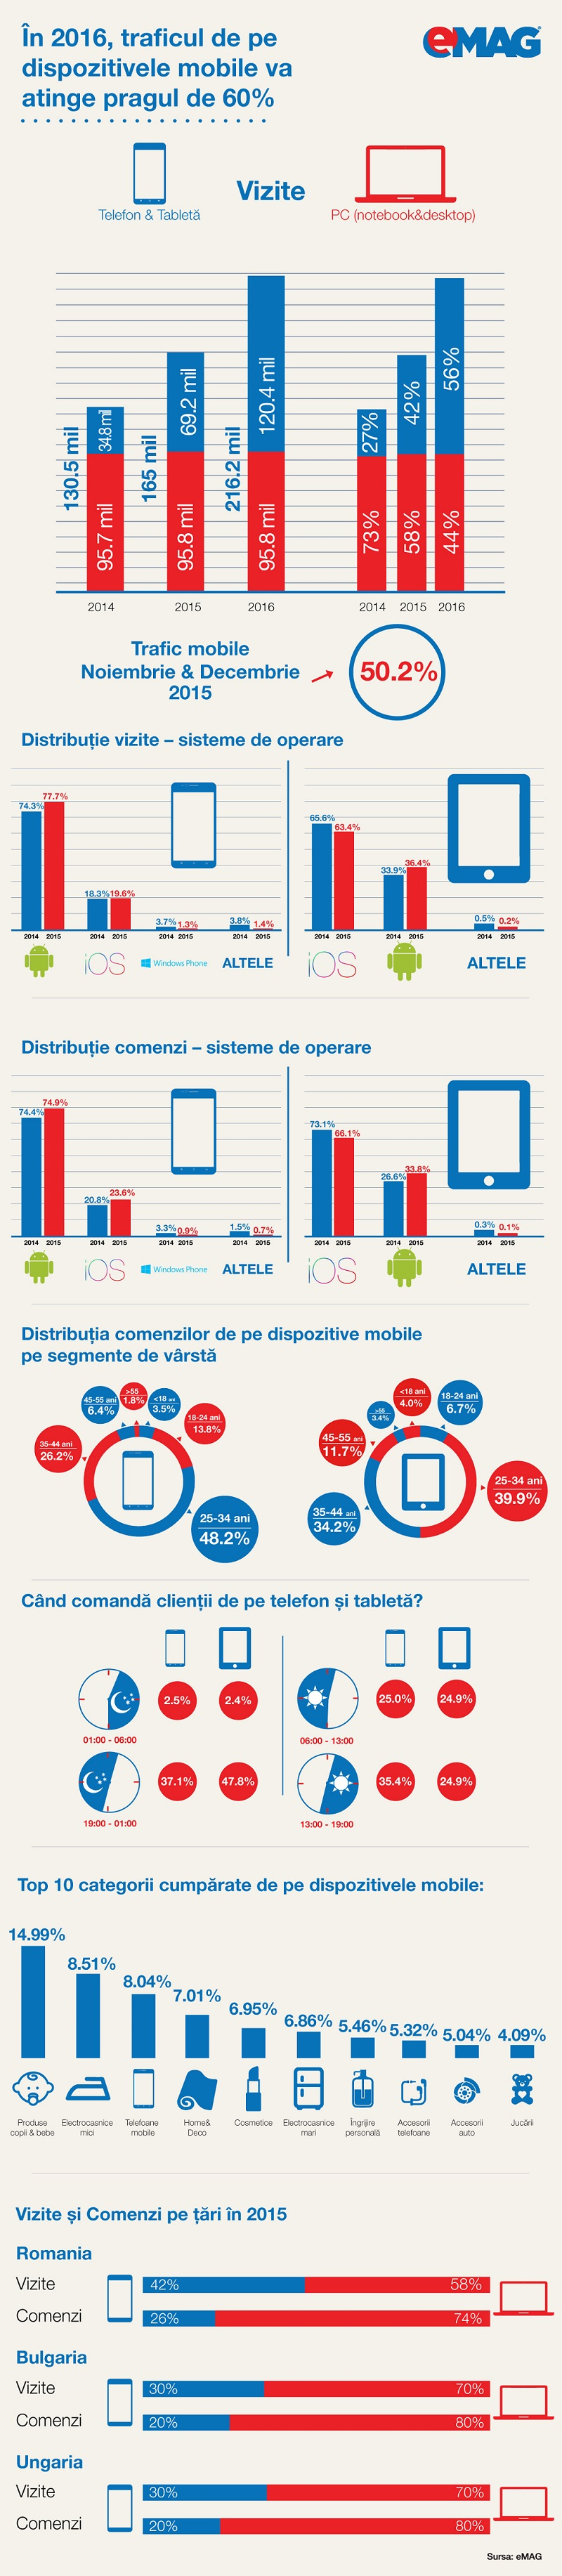 Infografic mobile eMAG 2015